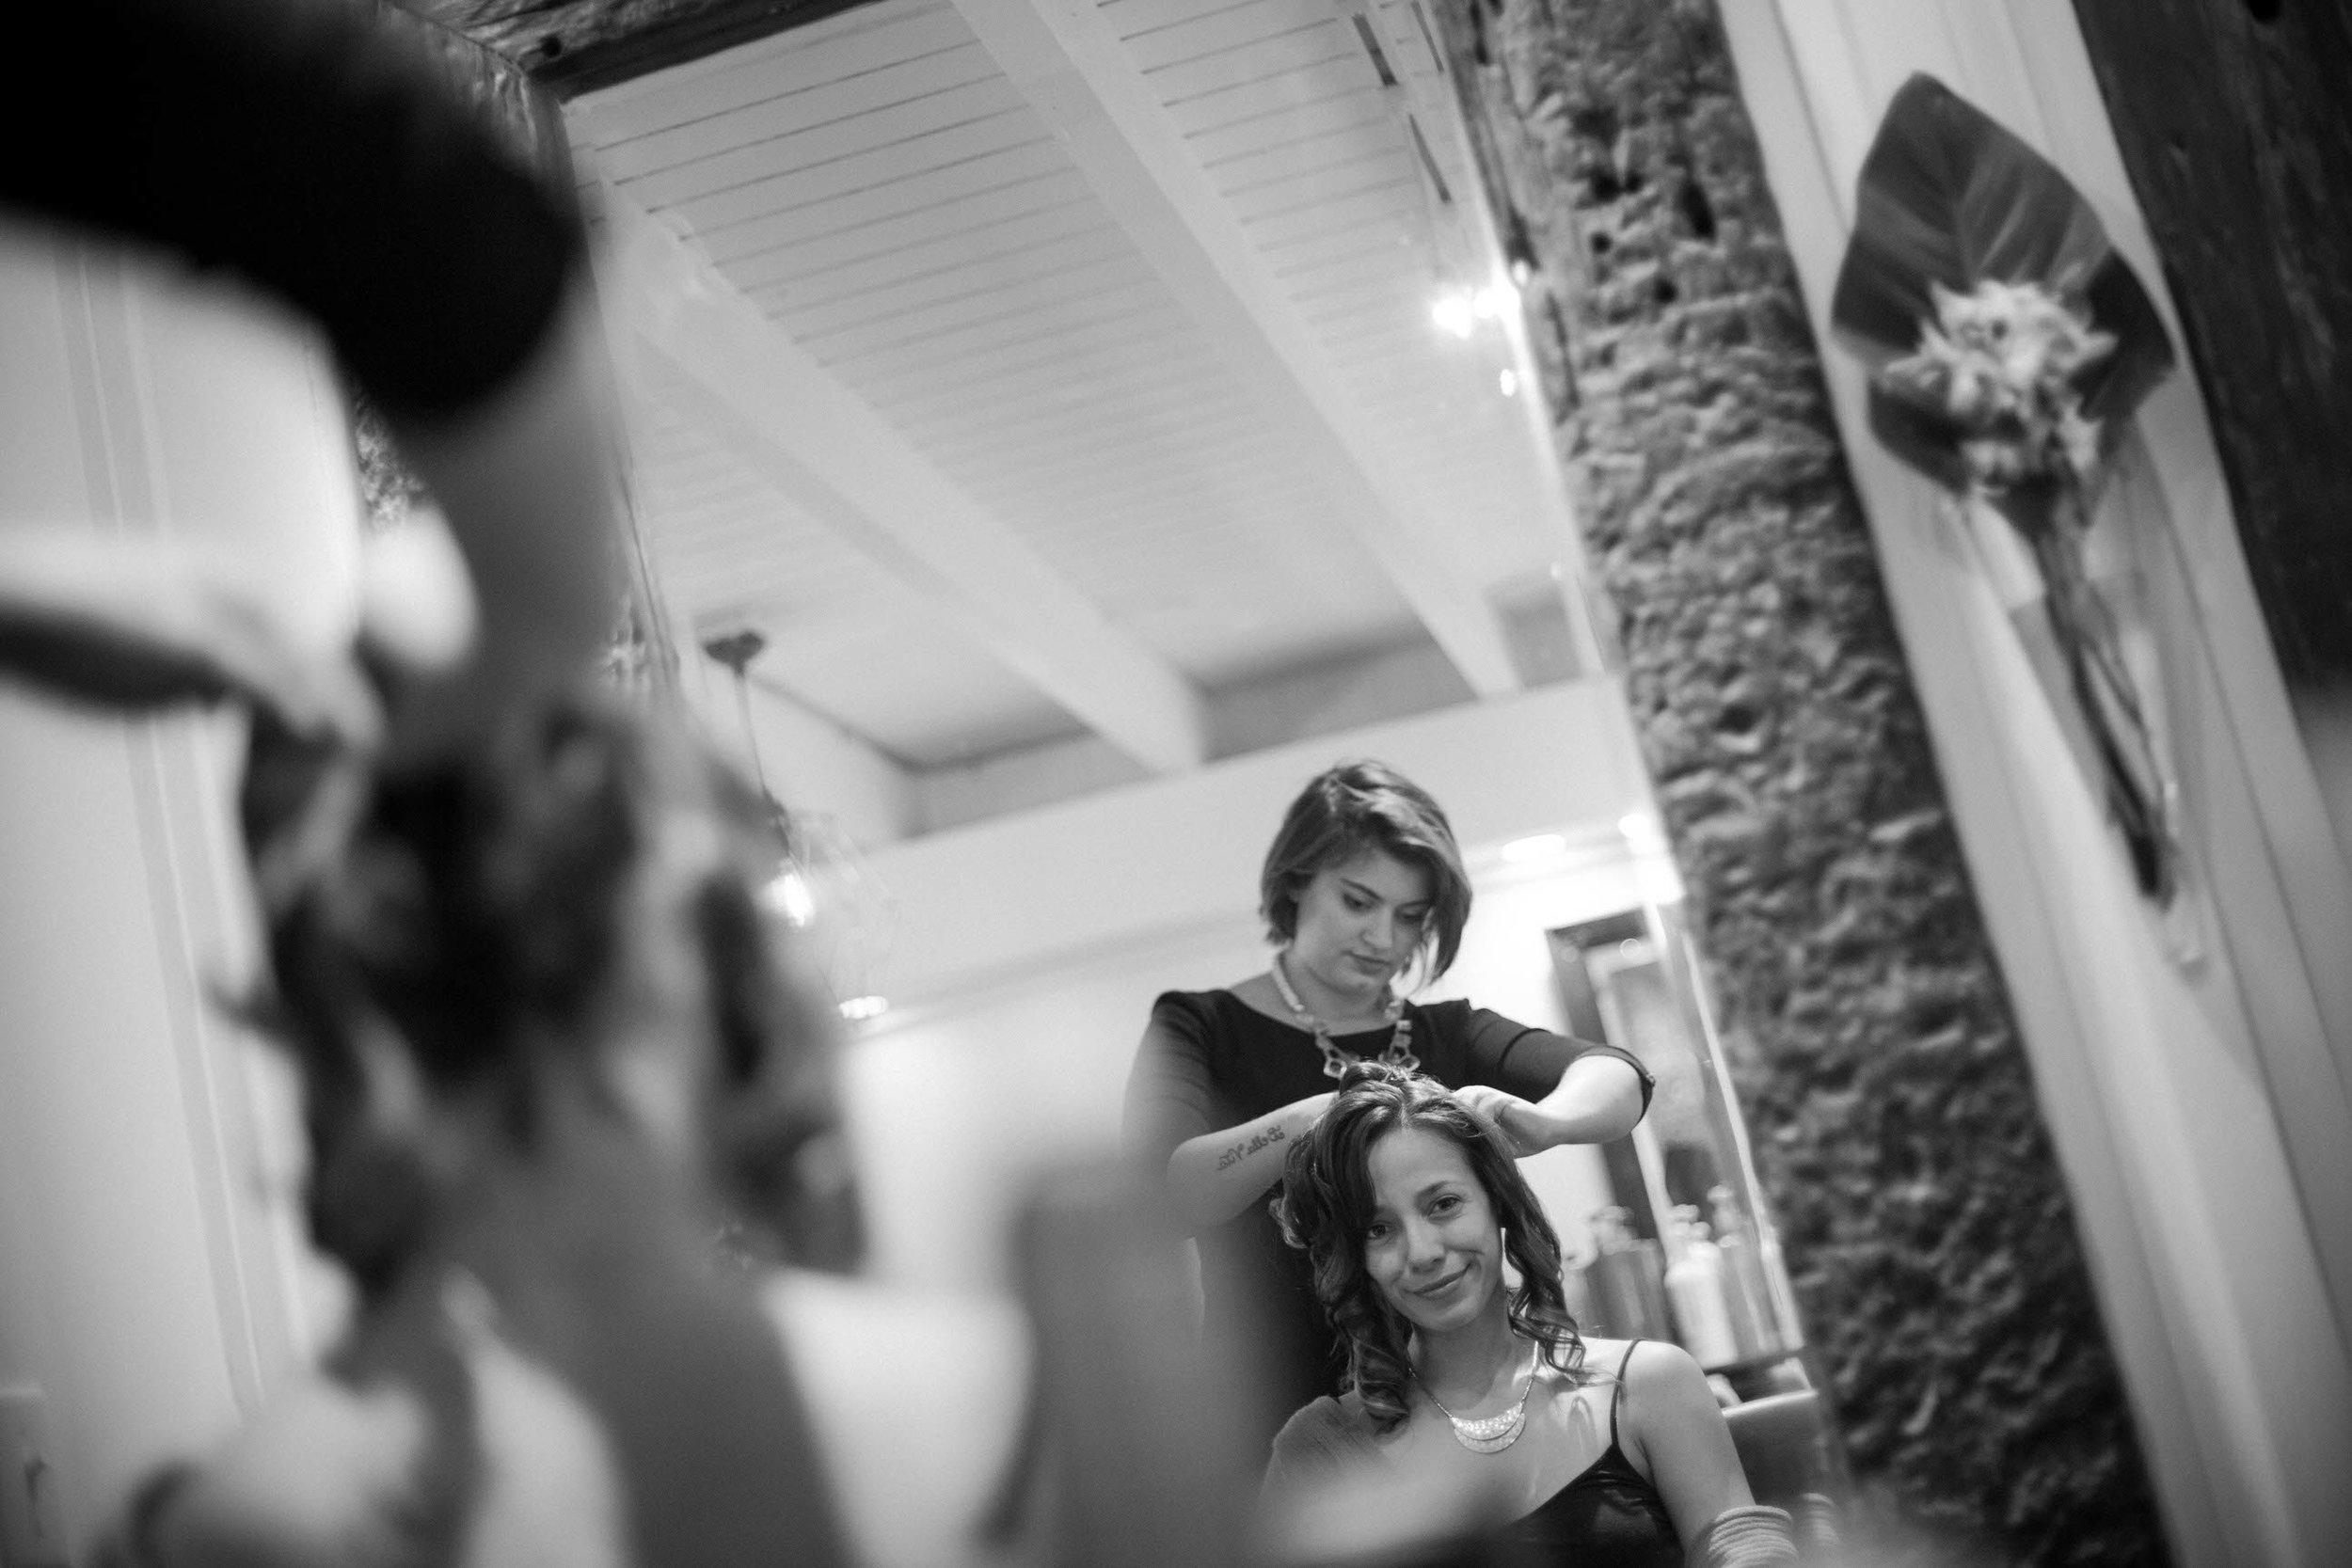 bride_getting_hair_done_key_west_florida_tiny_house_photo.jpg